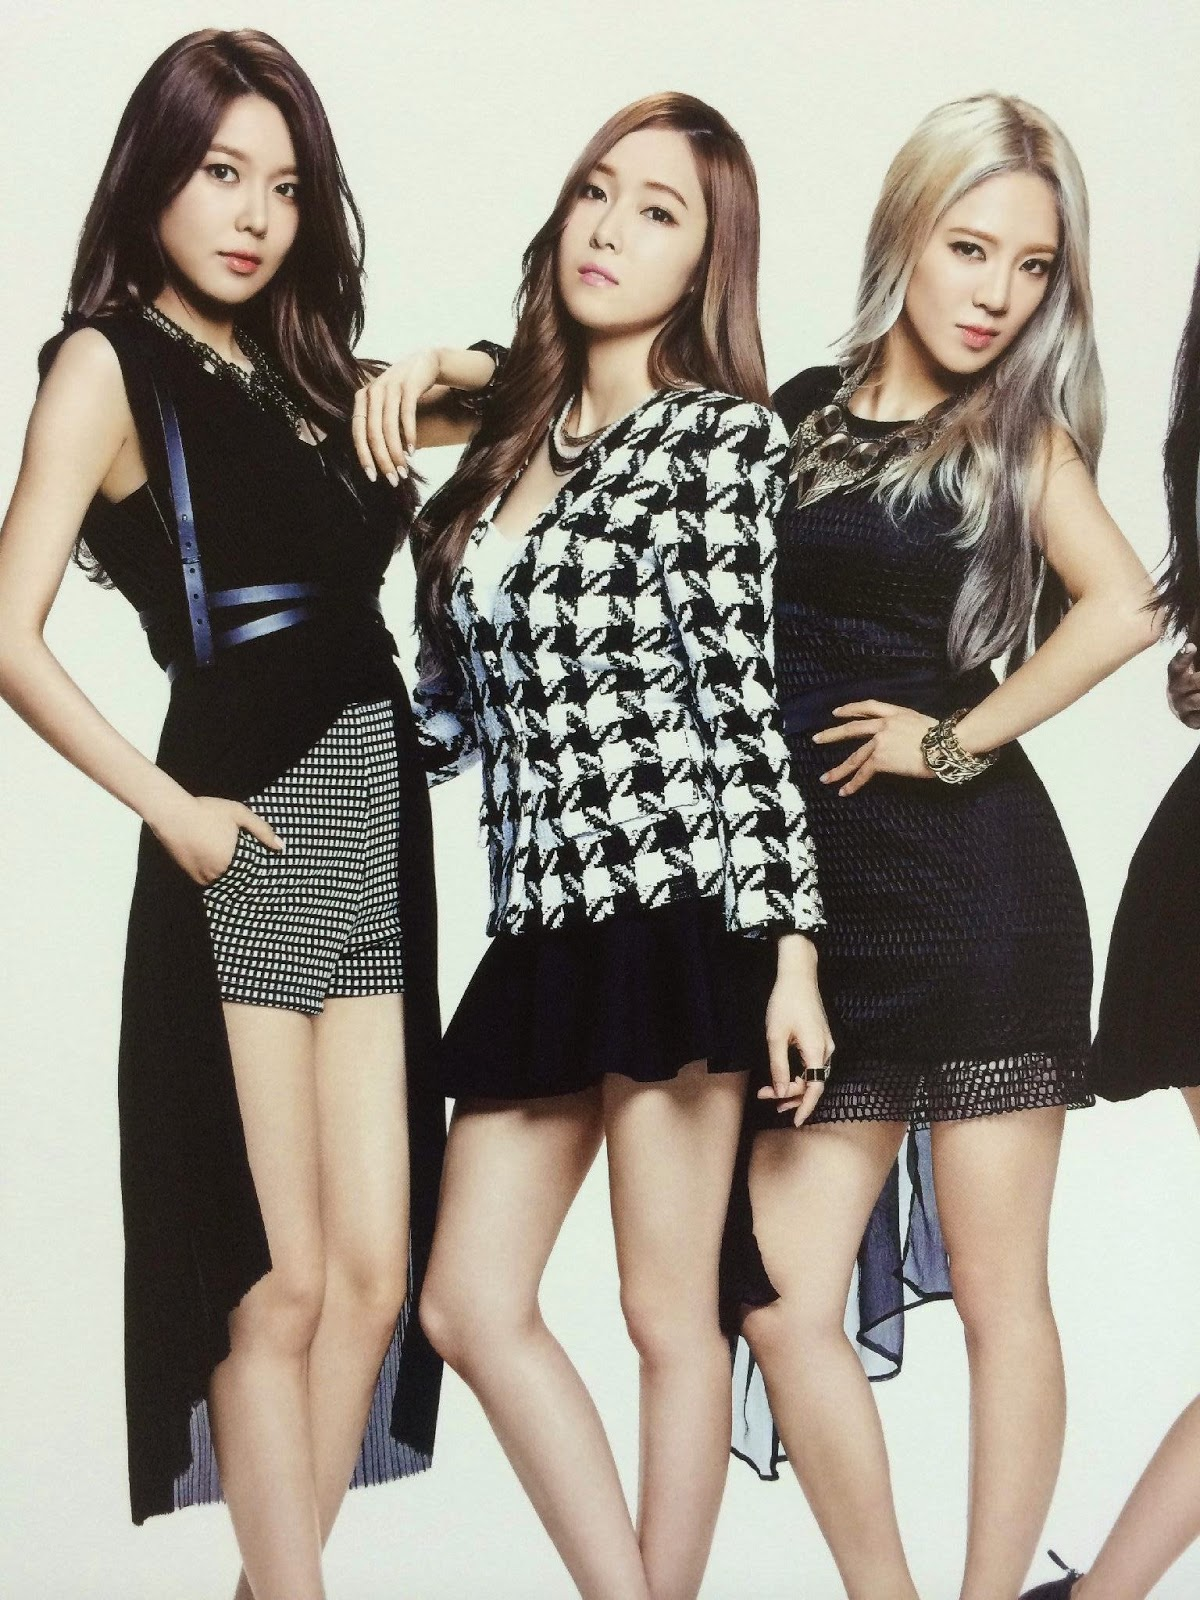 SNSD Girls Generation The Best Scan Photos 2